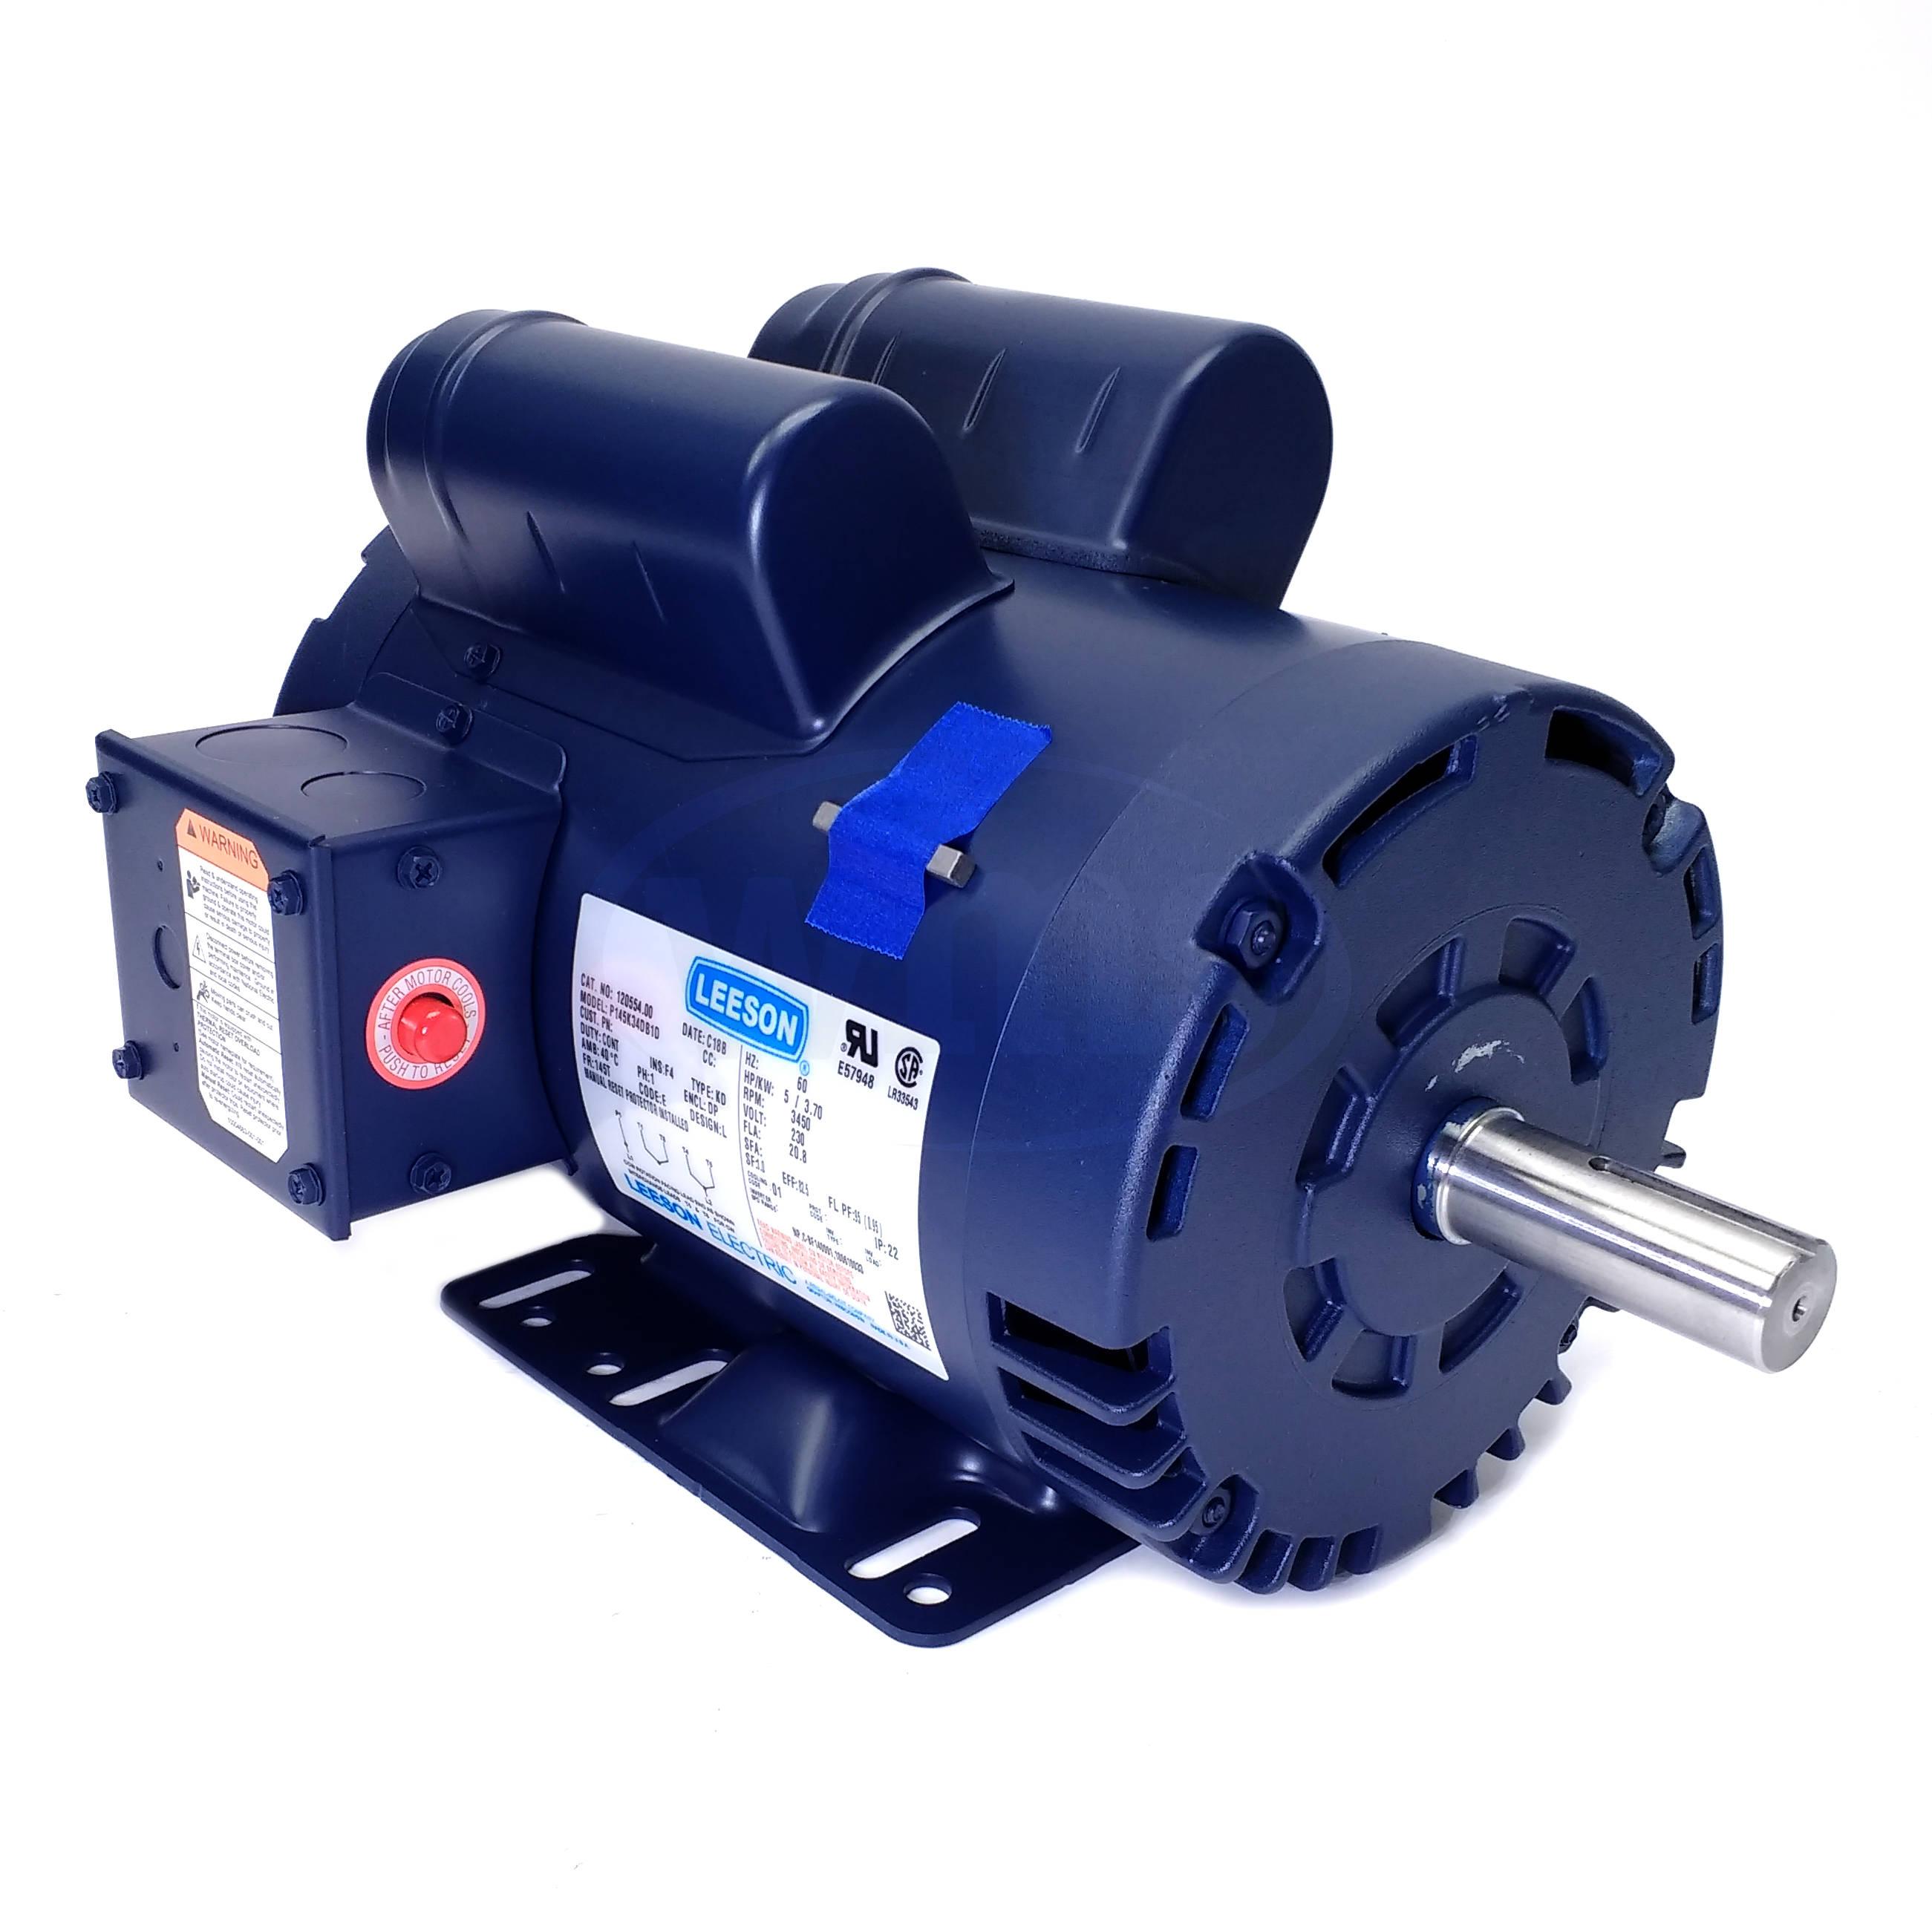 medium resolution of leeson 5 hp compressor motor wiring wiring diagram operations leeson 5 hp compressor motor wiring